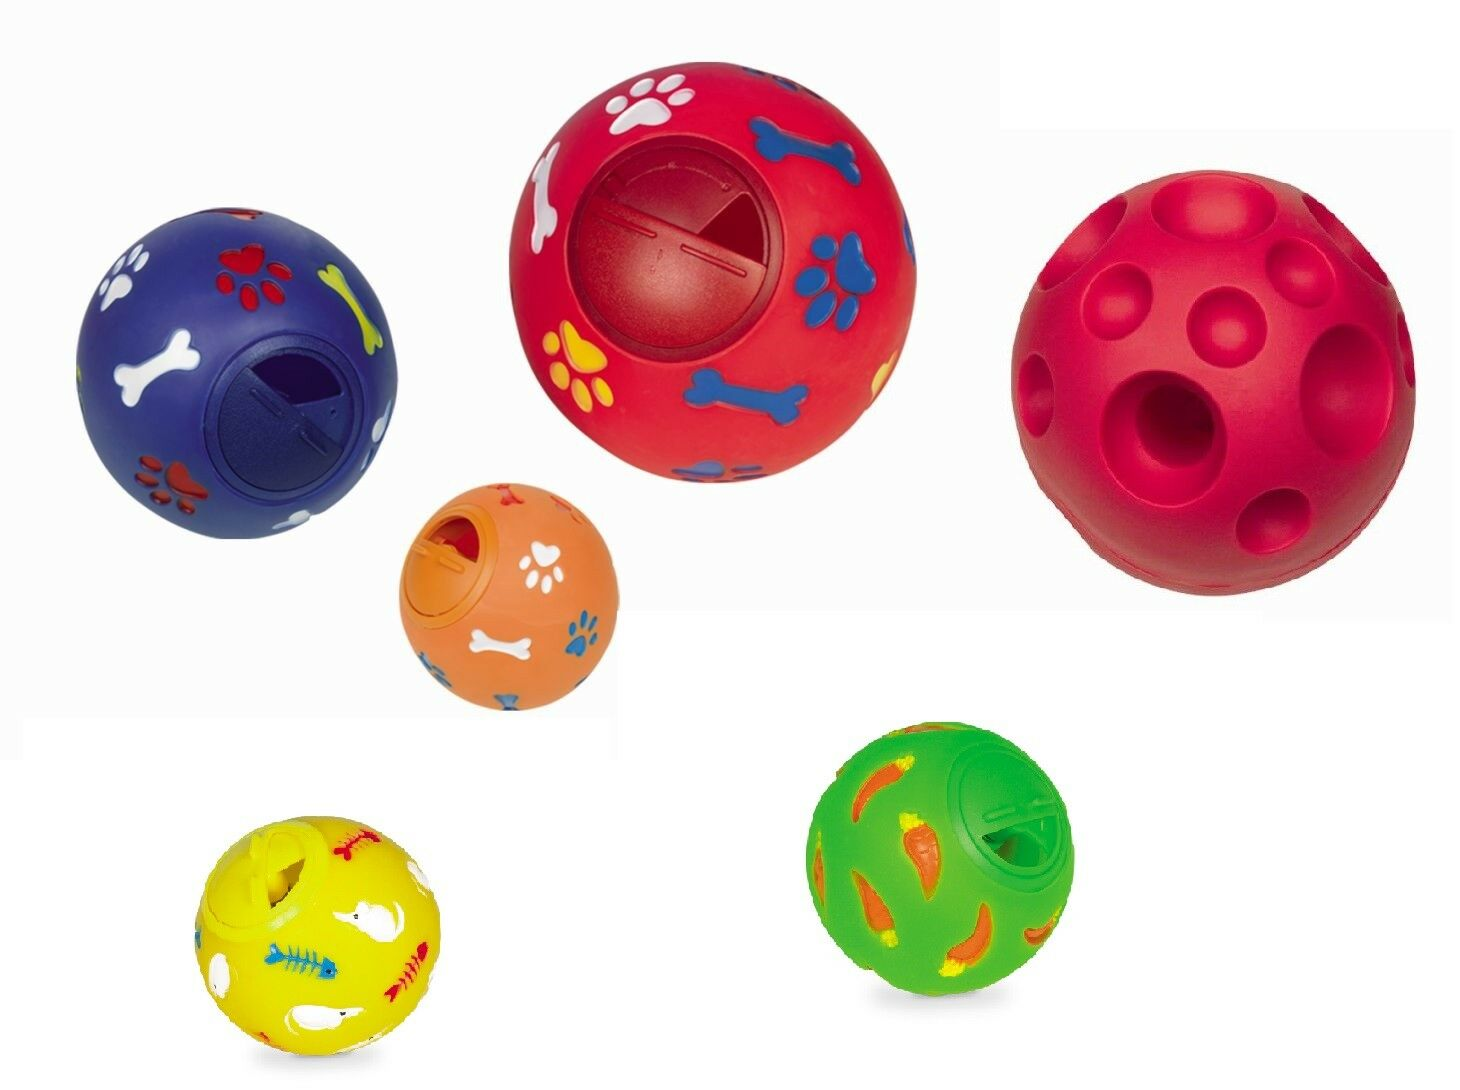 katzenball test vergleich katzenball g nstig kaufen. Black Bedroom Furniture Sets. Home Design Ideas